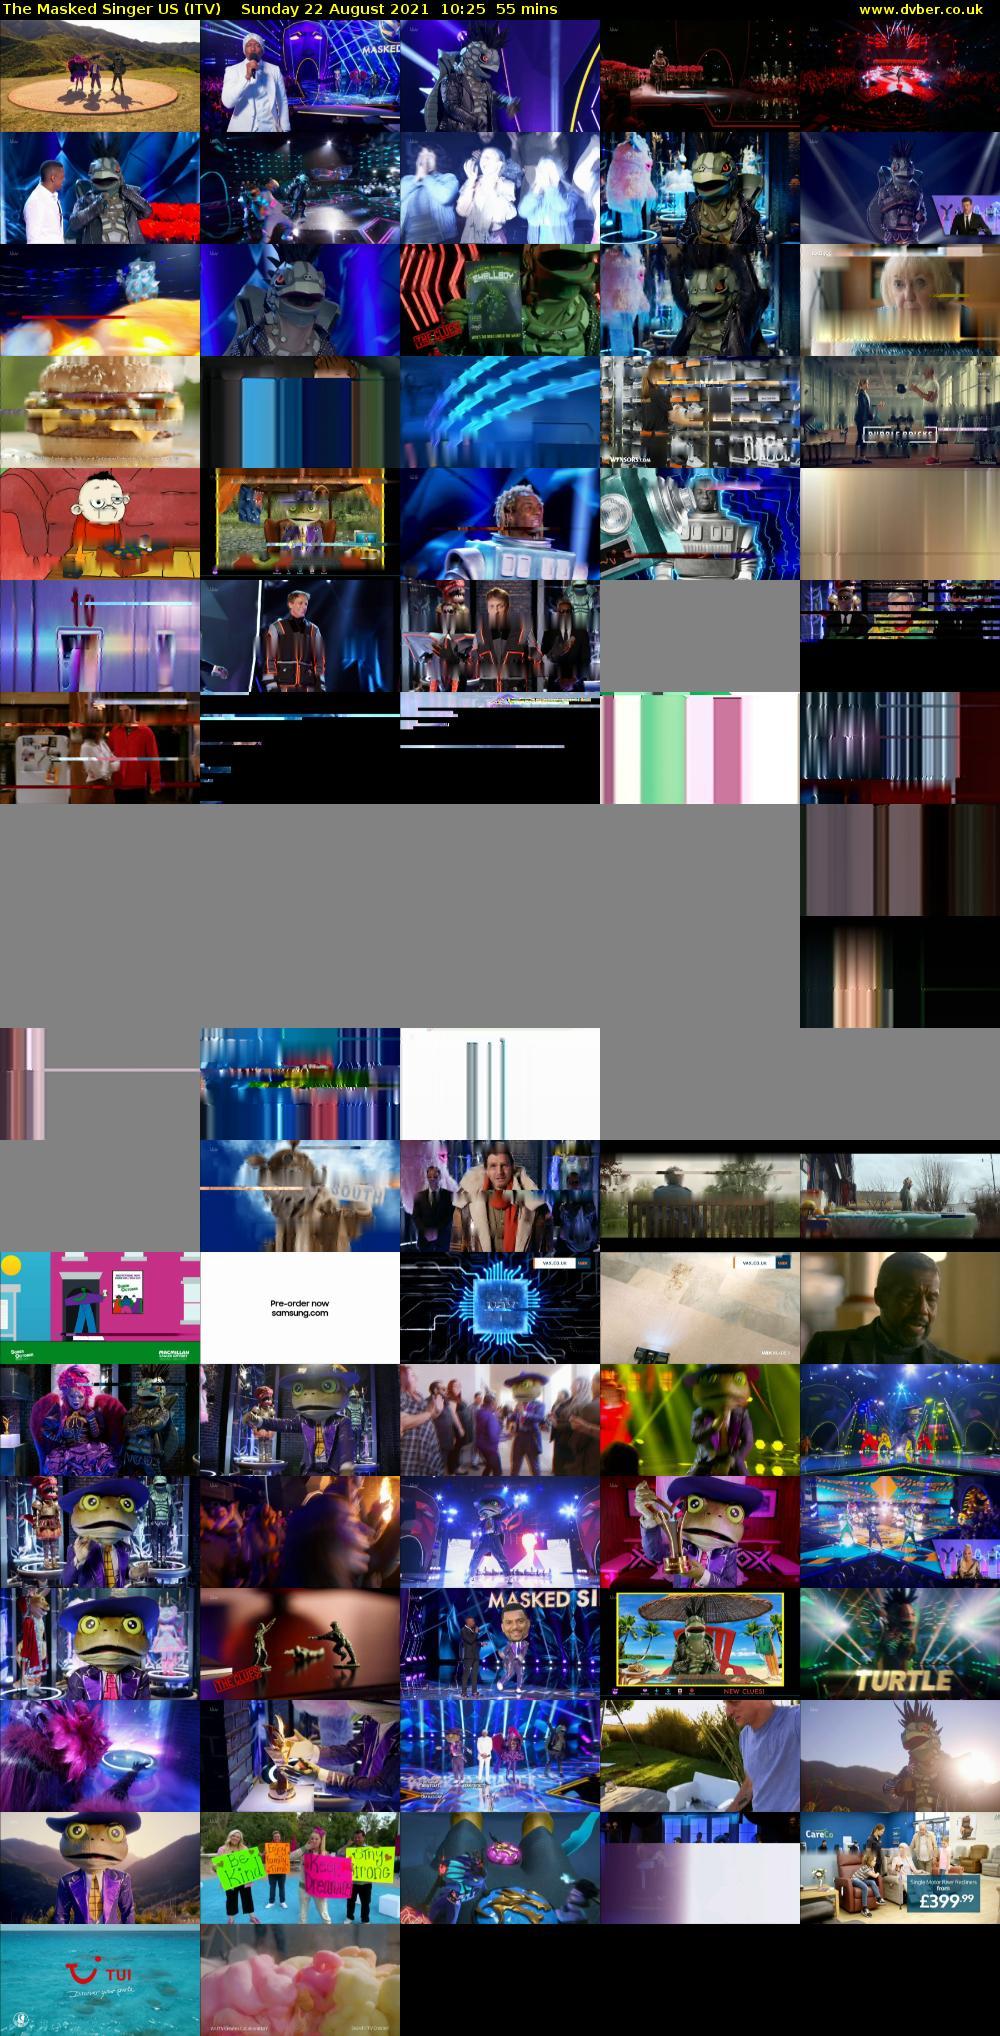 The Masked Singer US (ITV) - 2021-08-22-1025